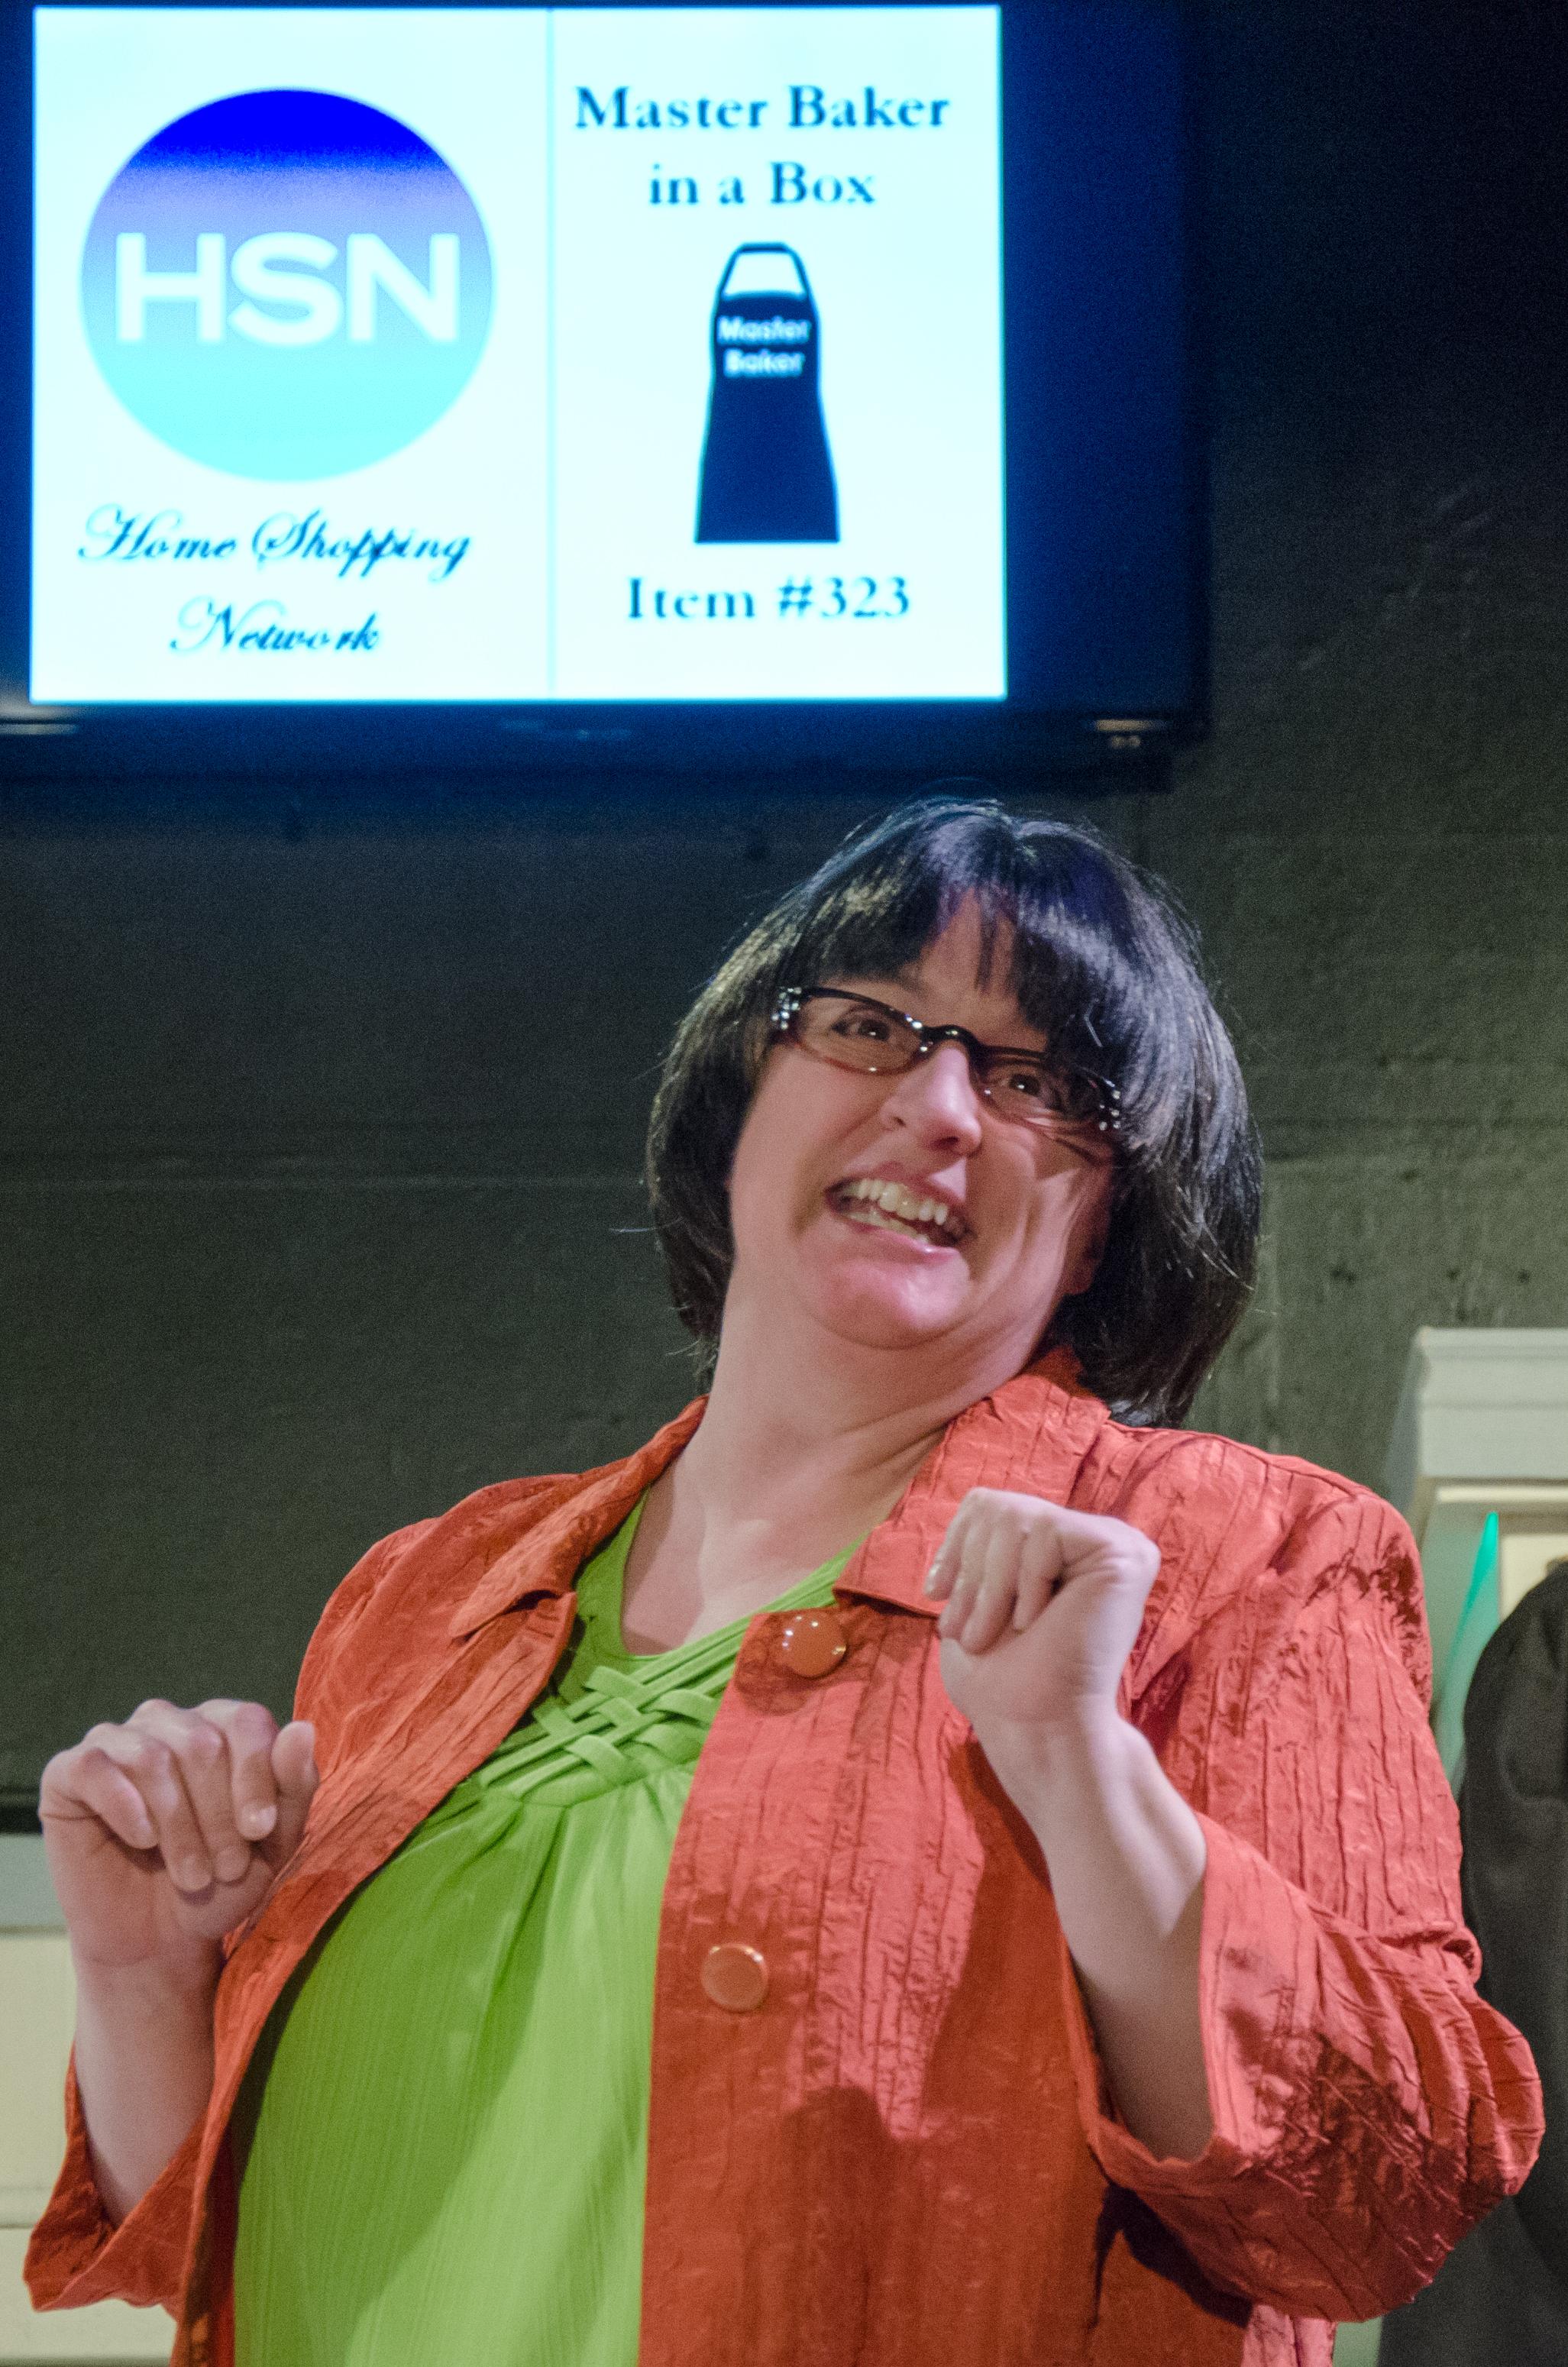 Home Shopping Network Hostess (Melissa Himmelreich Nicholson)